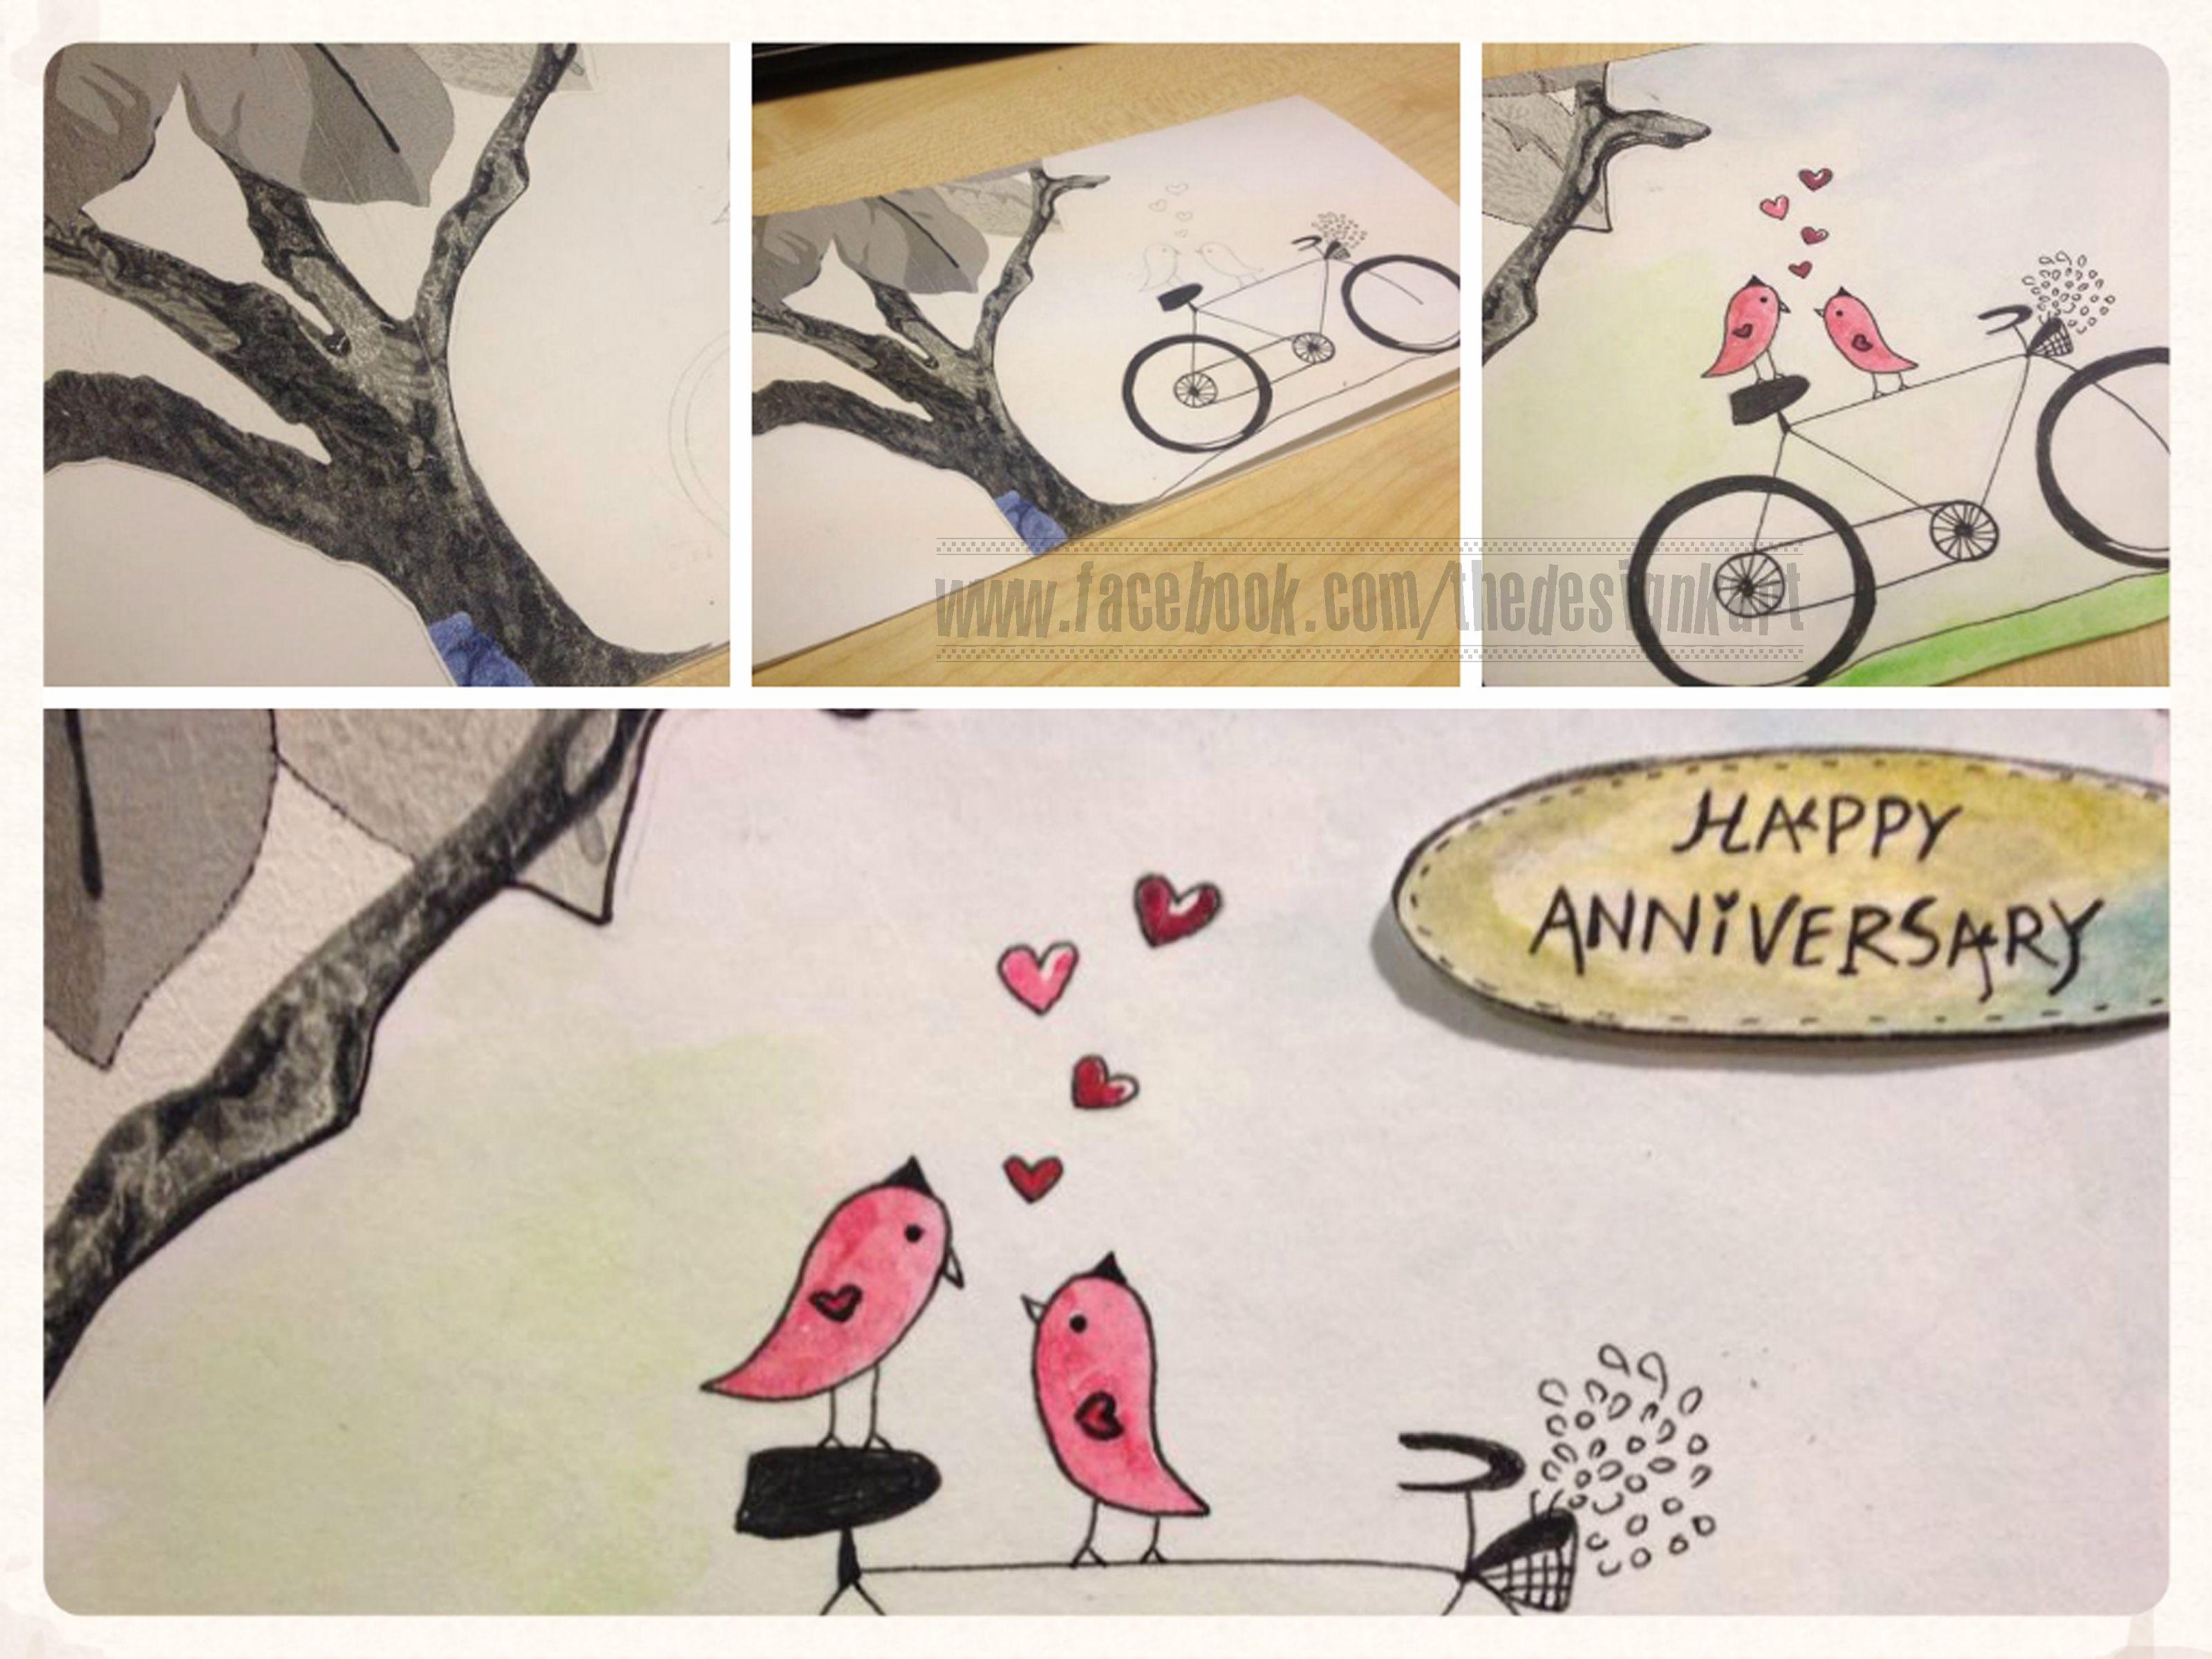 handmade card for anniversary  cards handmade handmade